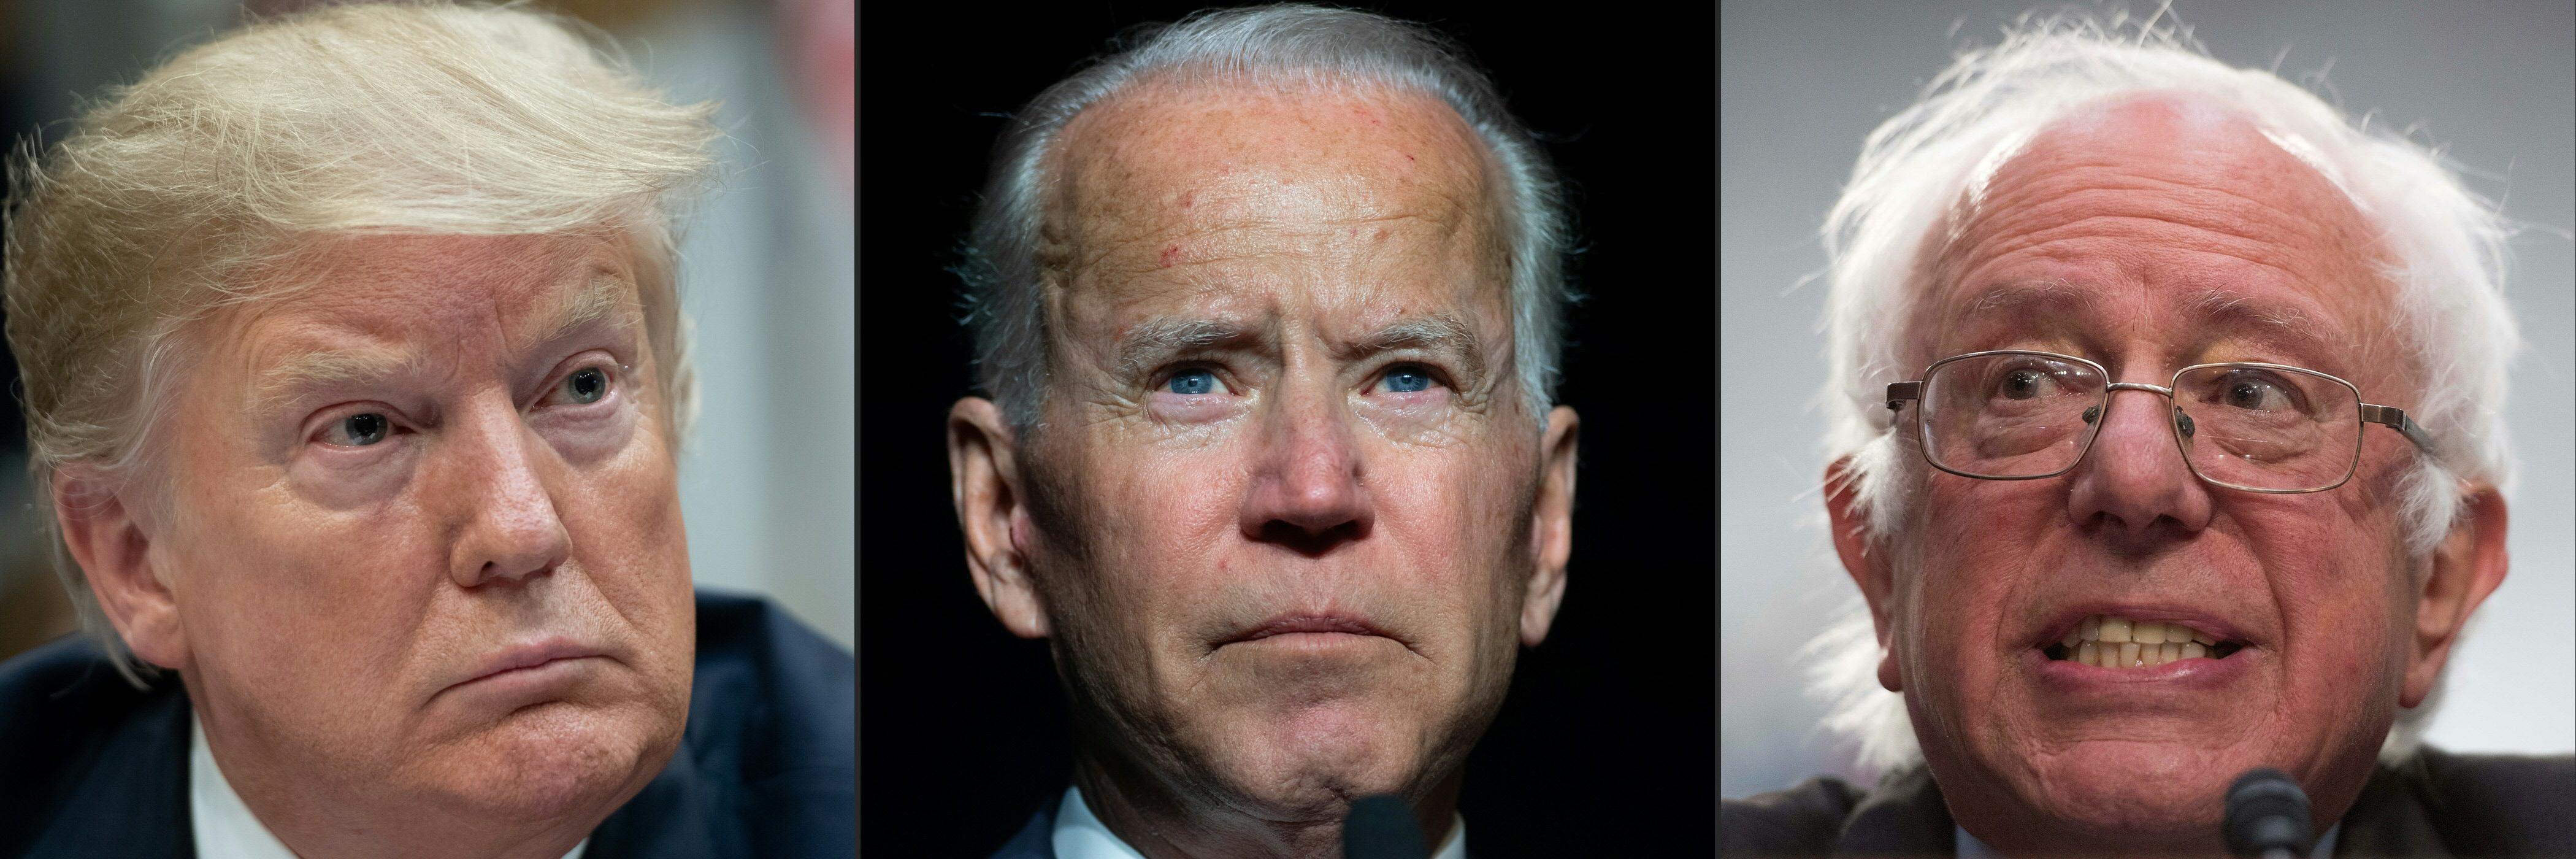 (Saul Loeb, Jim Watson/AFP/Getty Images)